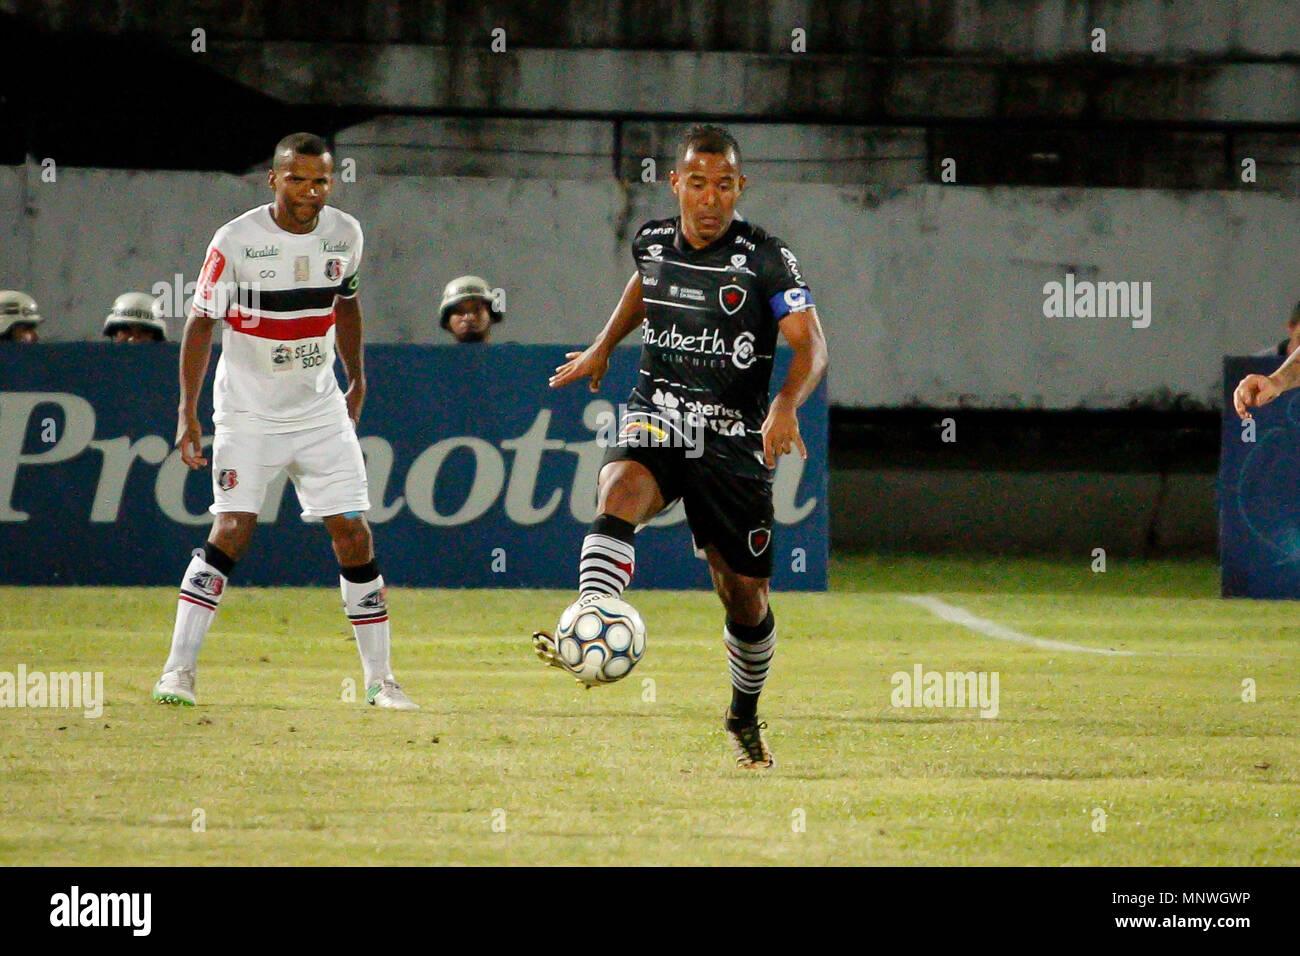 Recife, Brazil. 19th May, 2018. Marcos Aurelio Botafogo player ...